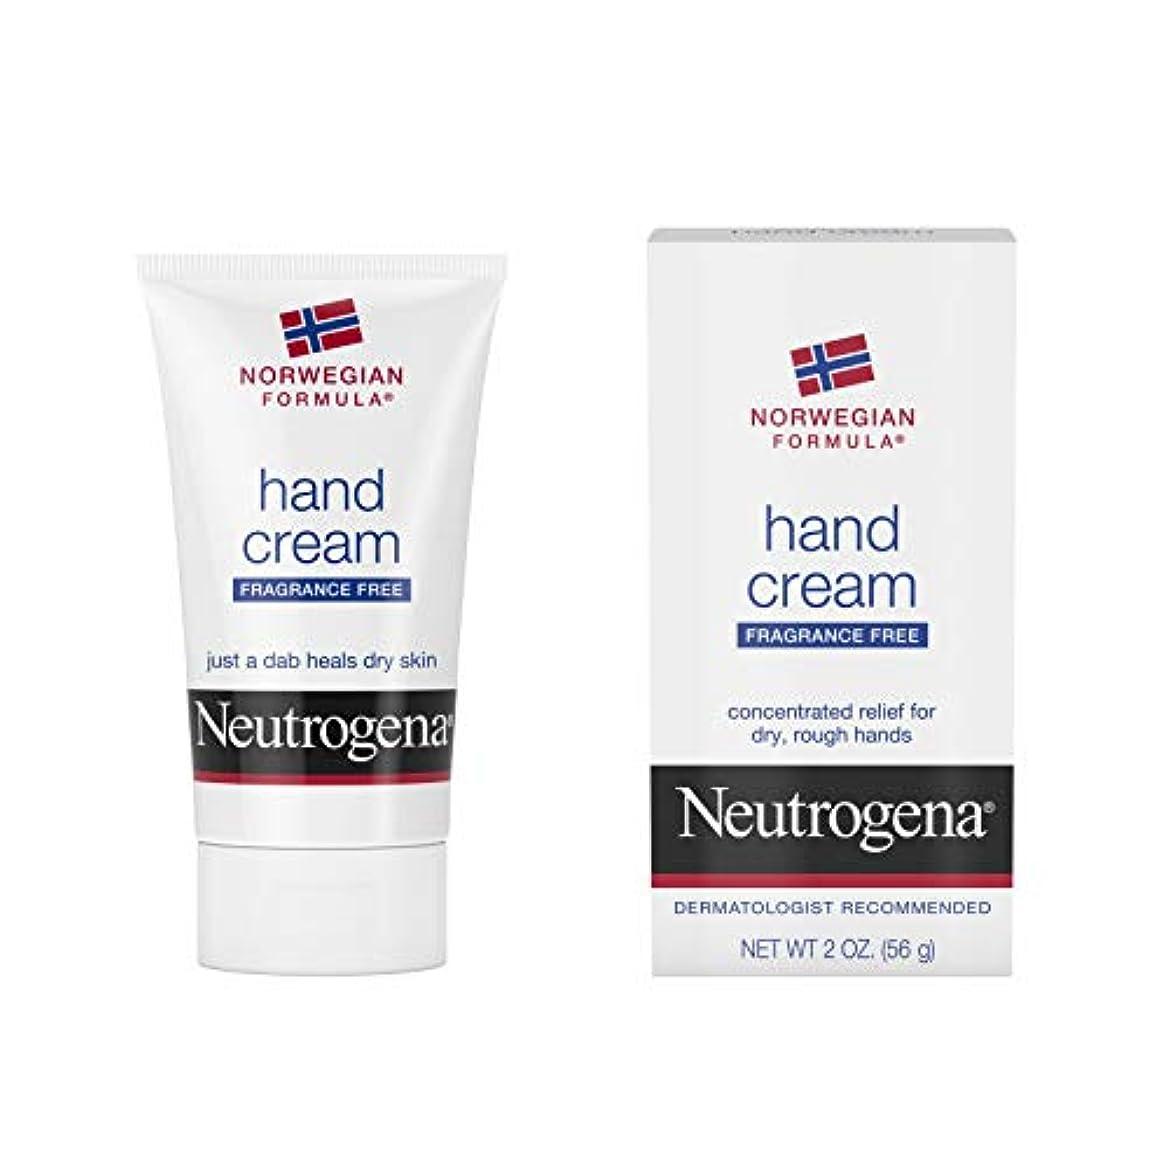 遷移耐久火山学者Neutrogena Norwegian Formula Hand Cream Fragrance-Free 60 ml (並行輸入品)